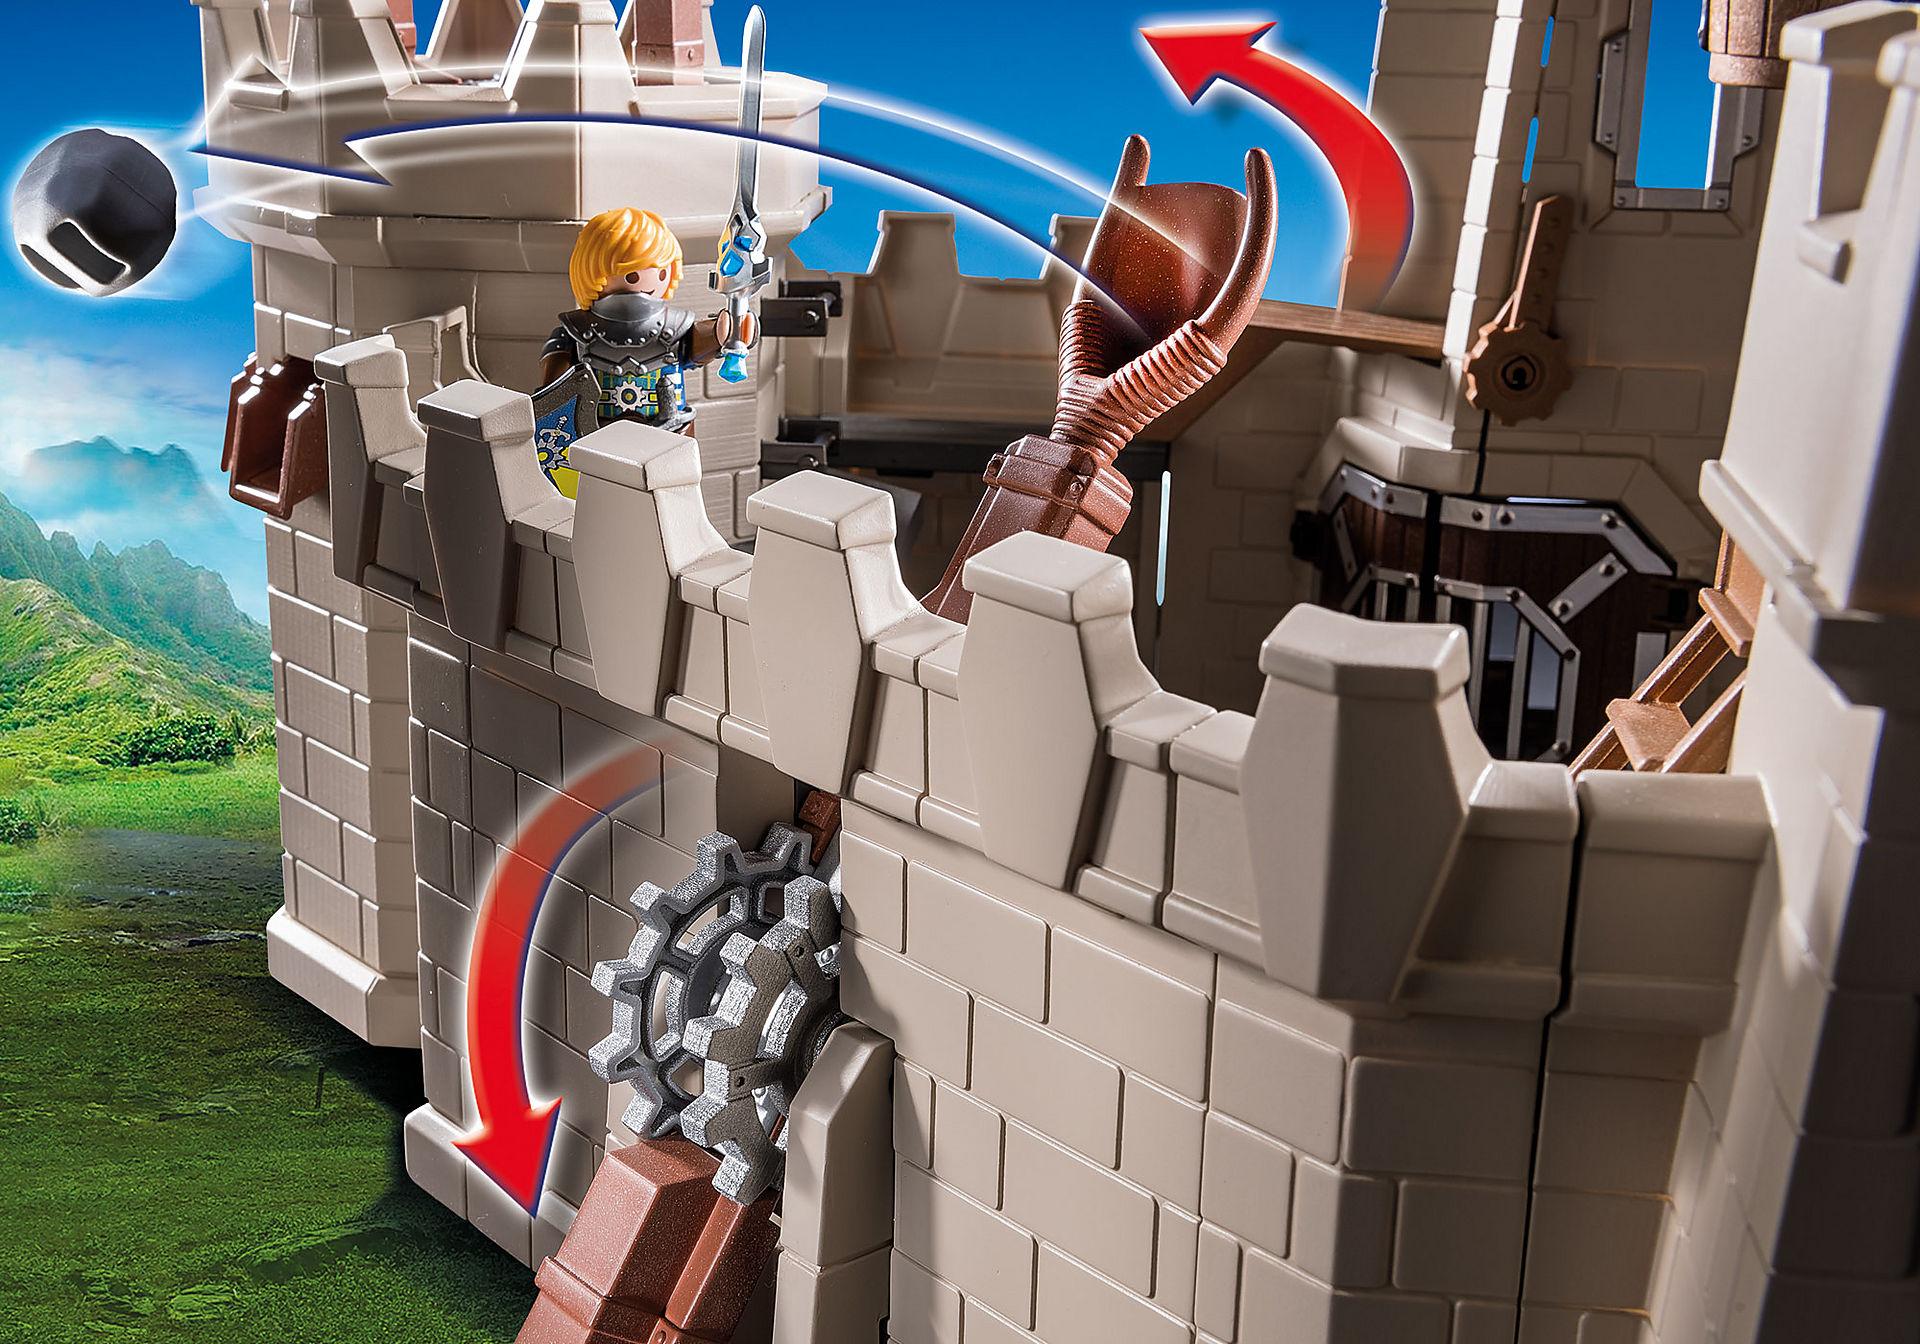 http://media.playmobil.com/i/playmobil/70220_product_extra5/Grote burcht van de Novelmore ridders